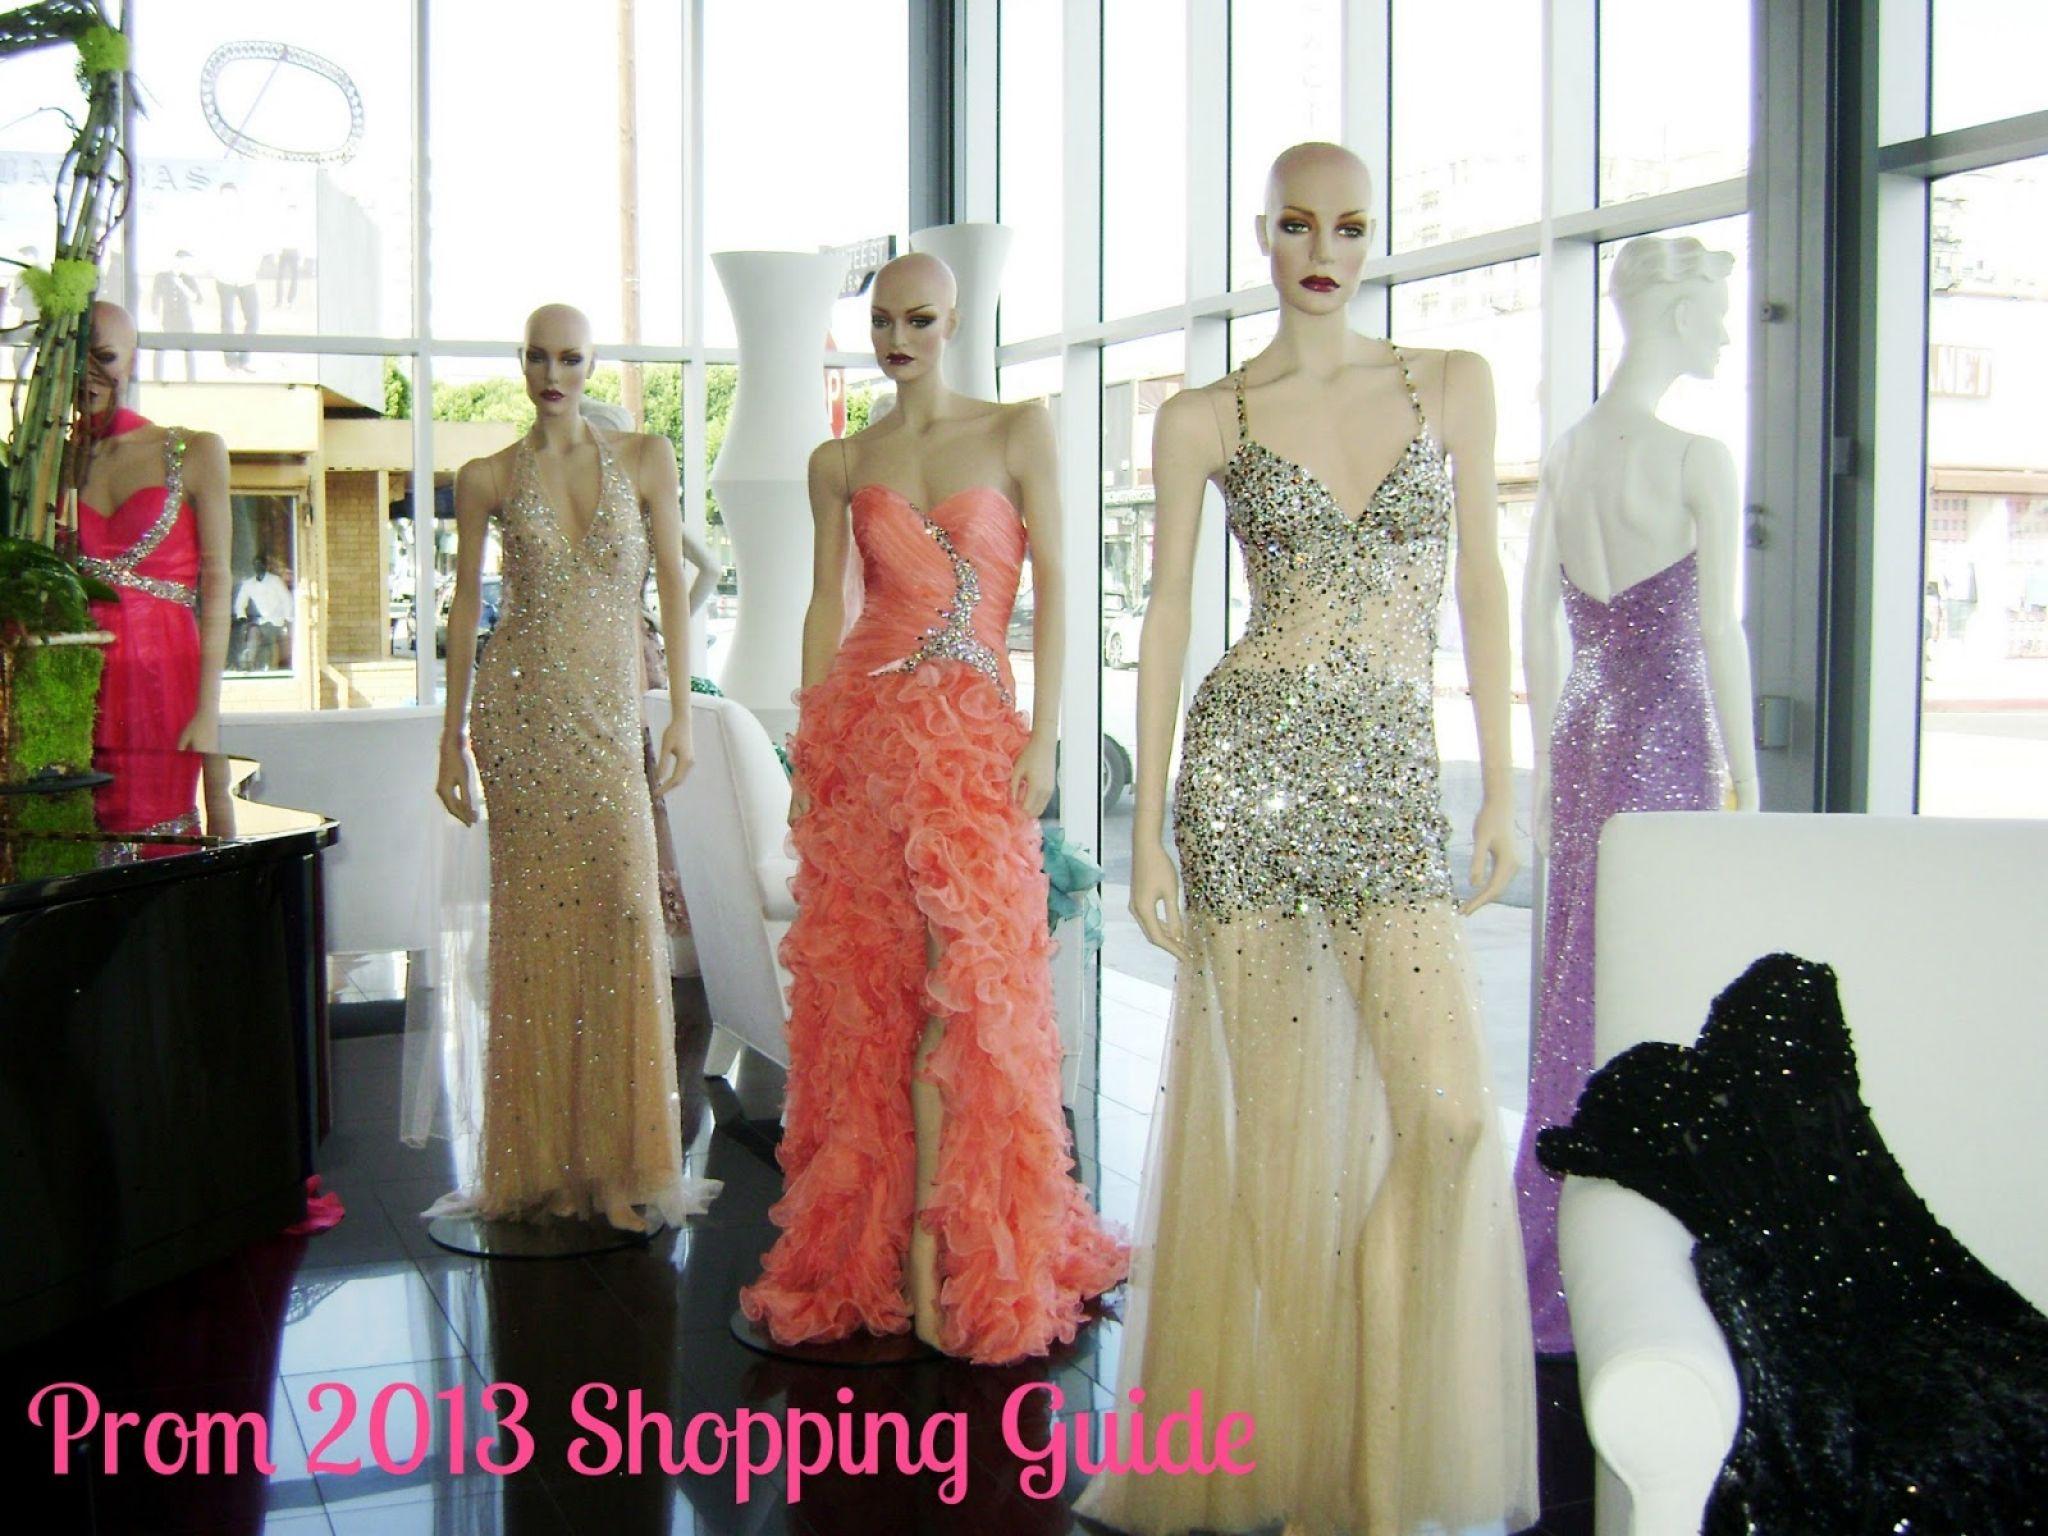 Los Angeles Garment District Wedding Dresses Informal Wedding Dresses For Older Brides Check More At Http Cute Short Prom Dresses Prom Dress Stores Fashion